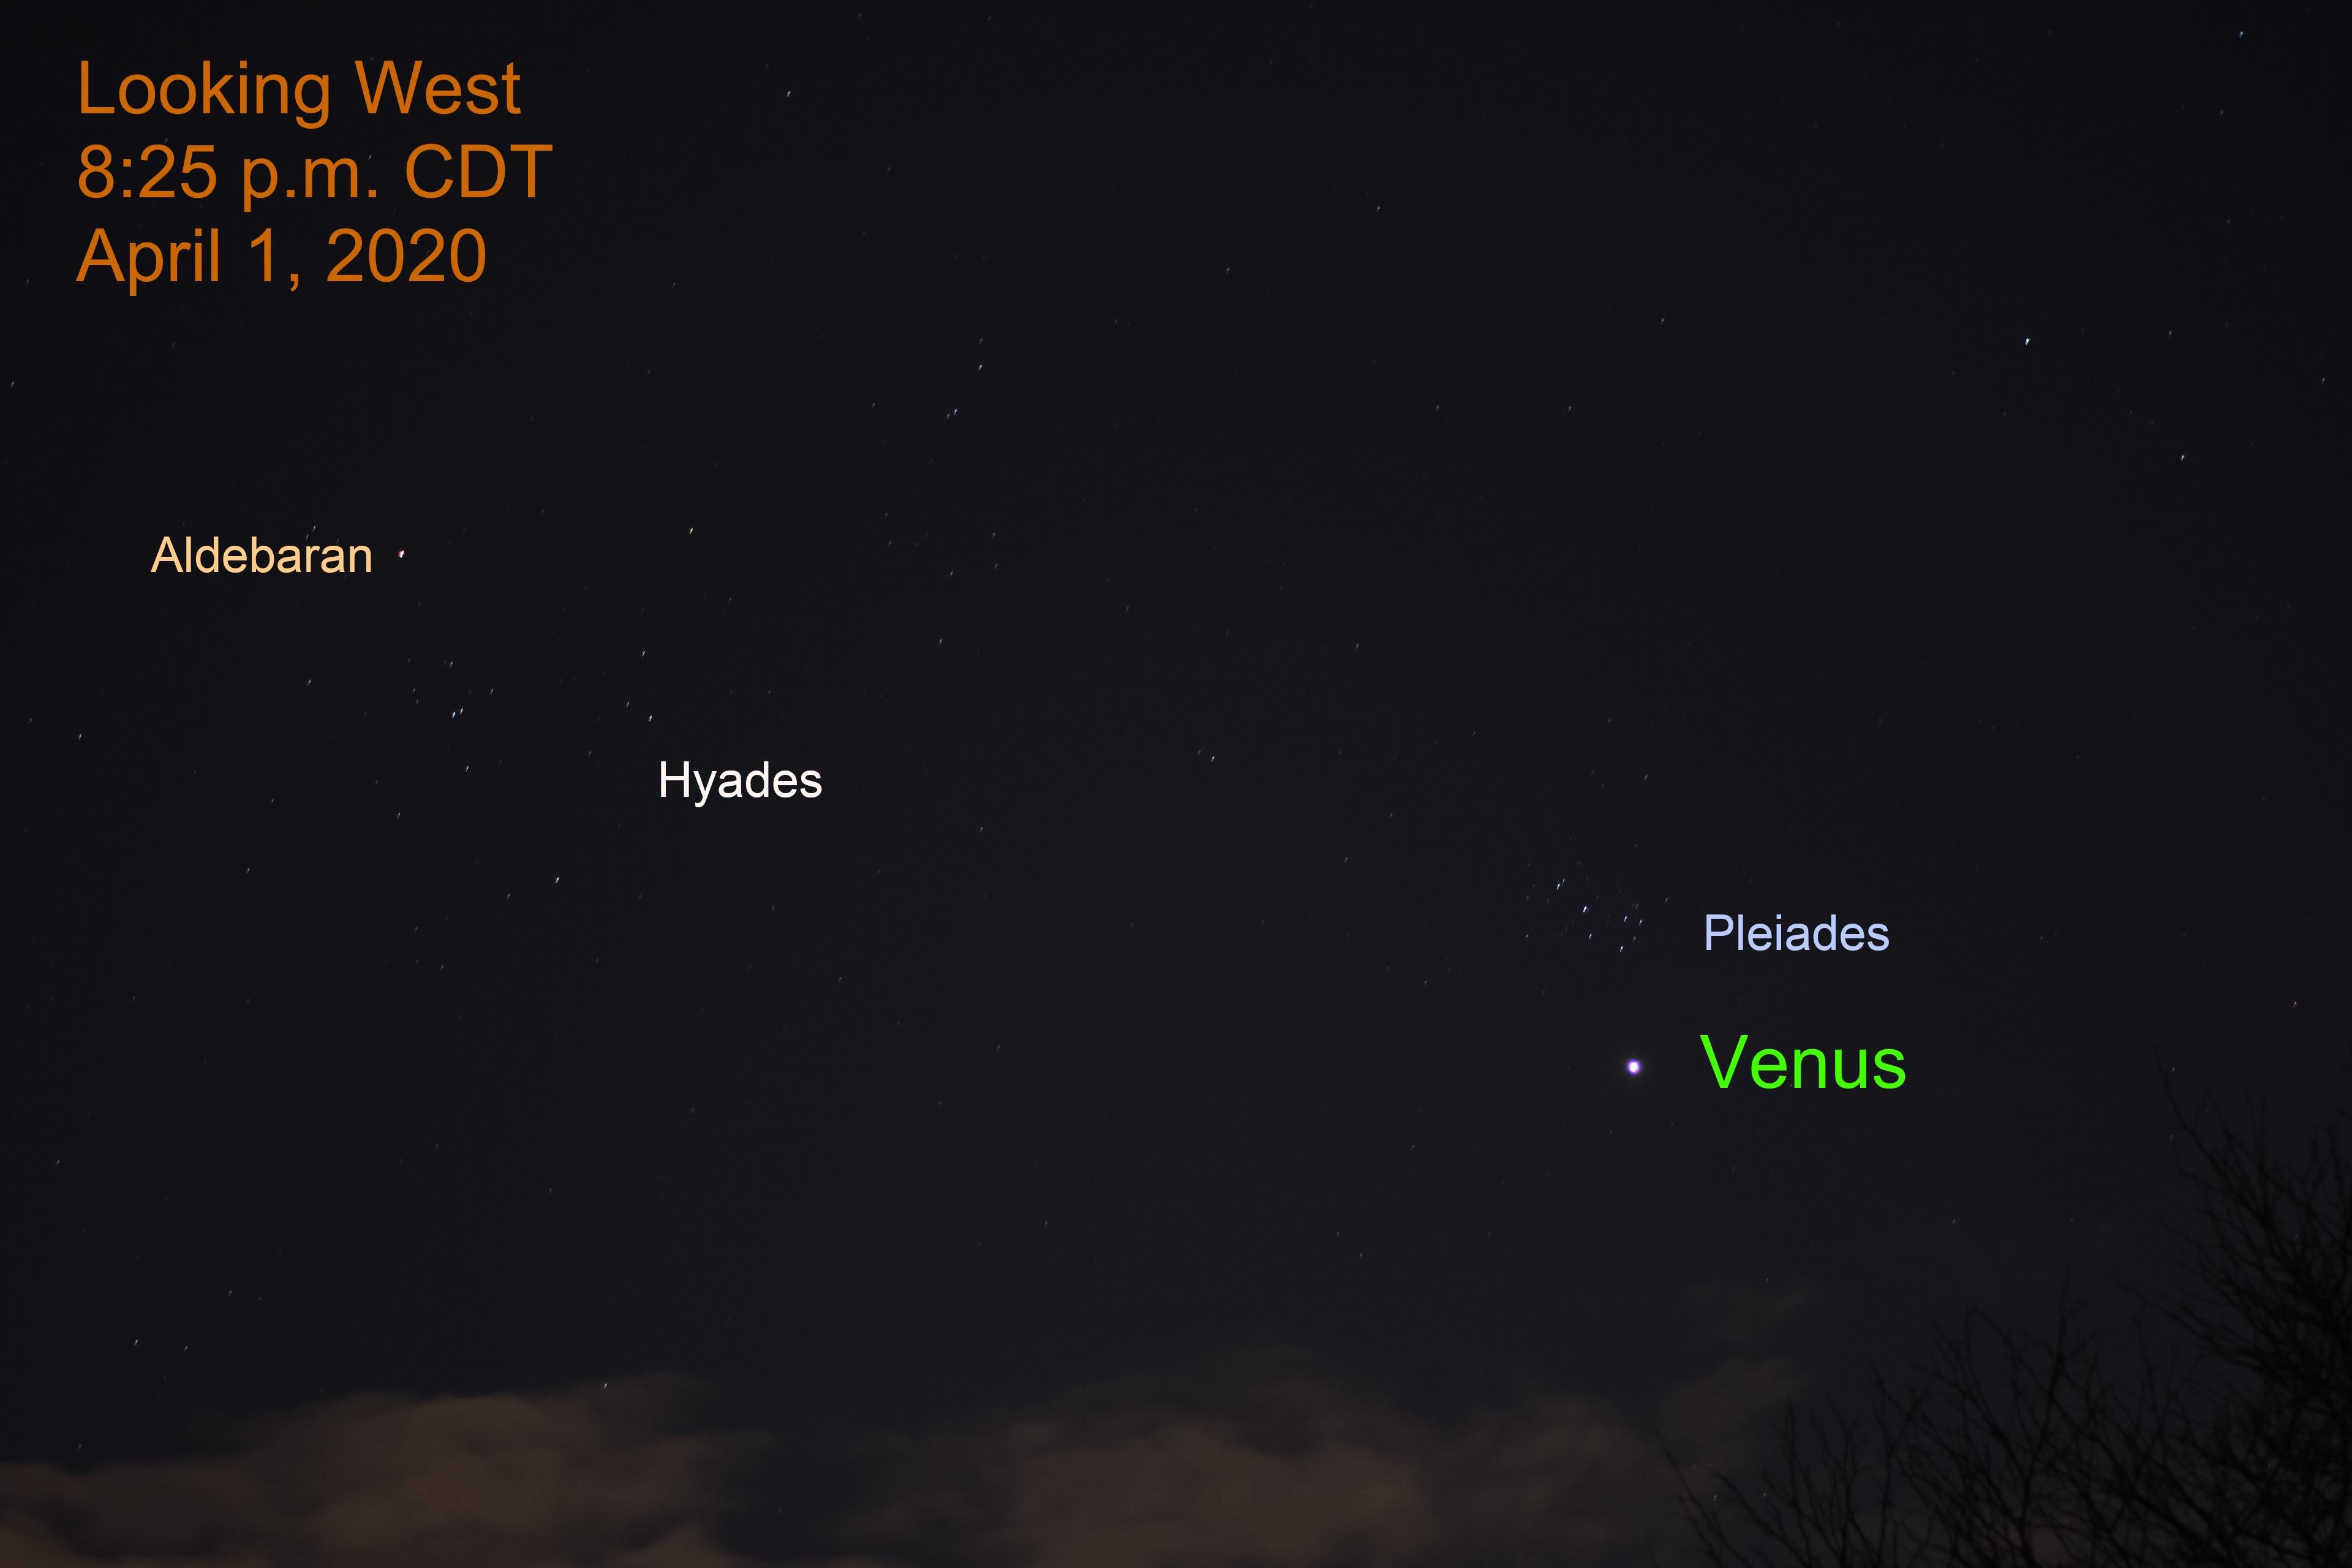 Venus and Pleiades, April 1, 2020